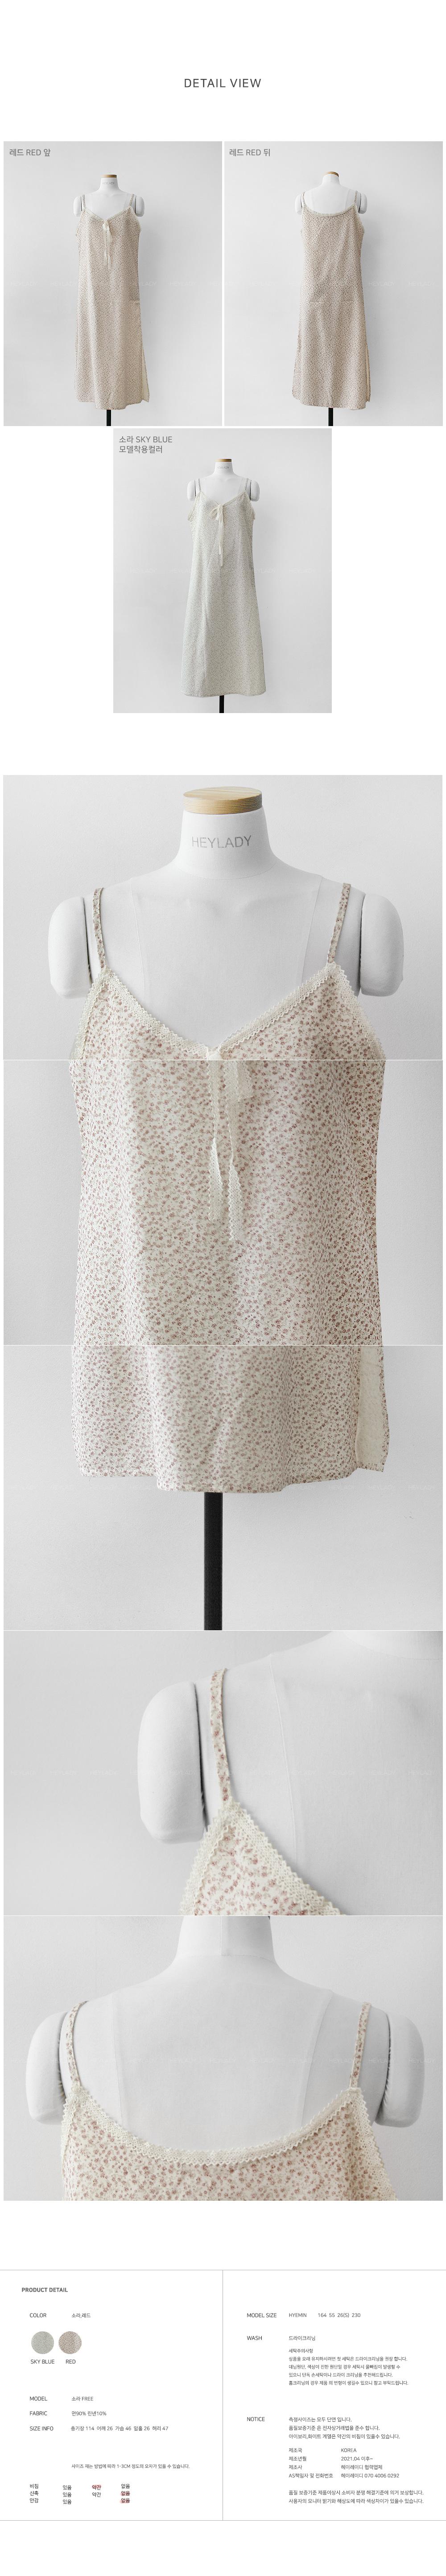 Geo-Turn Lace Dress